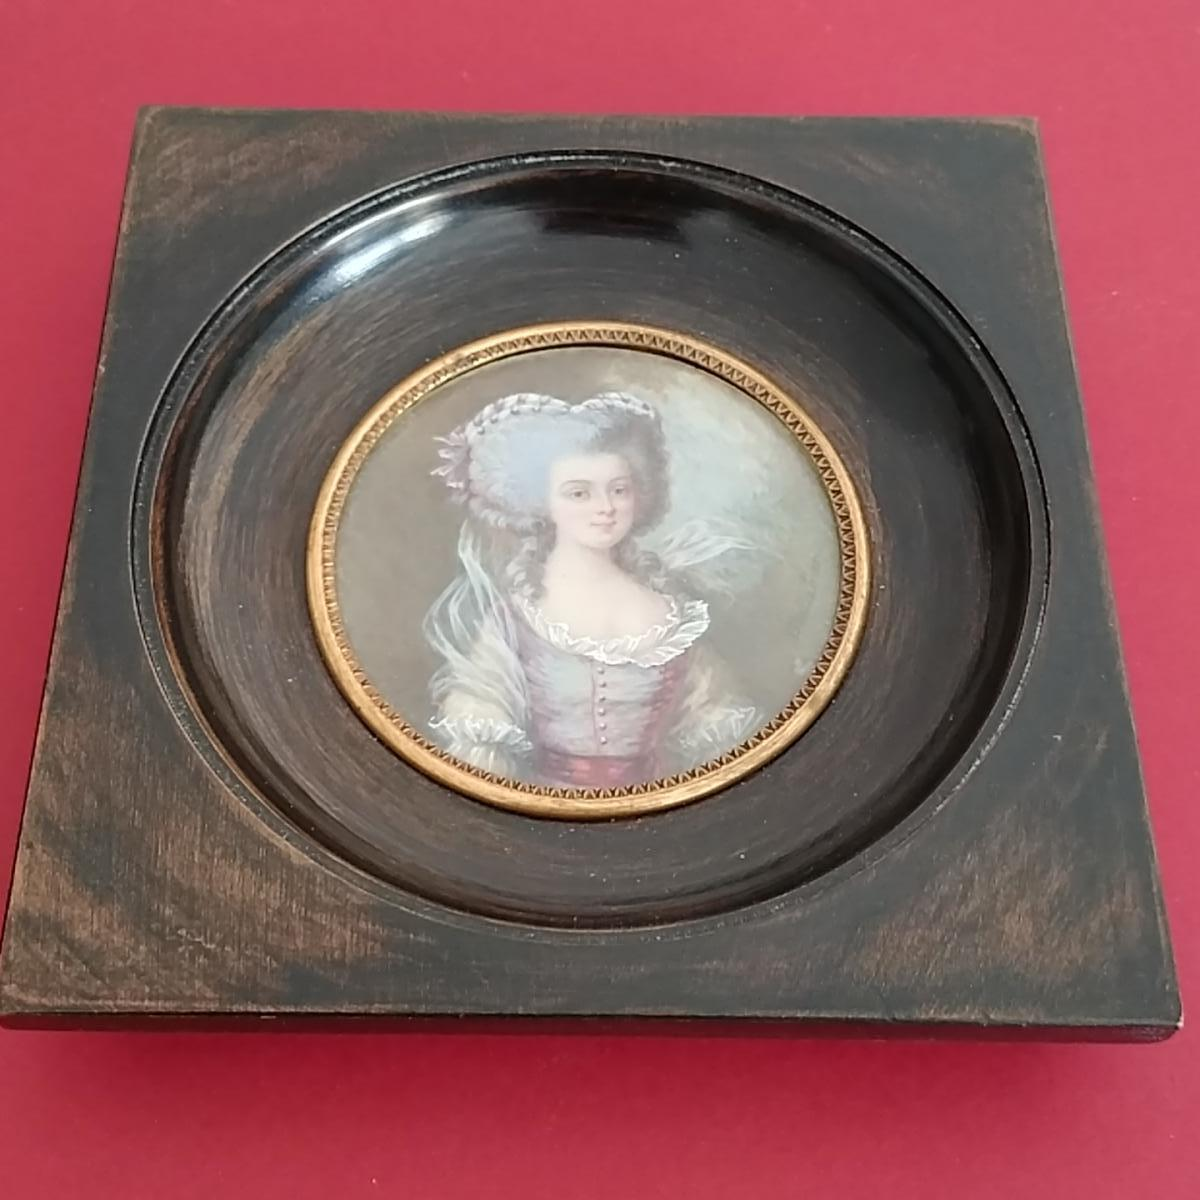 Thumbnail Of Galaran - Mademoiselle Contat